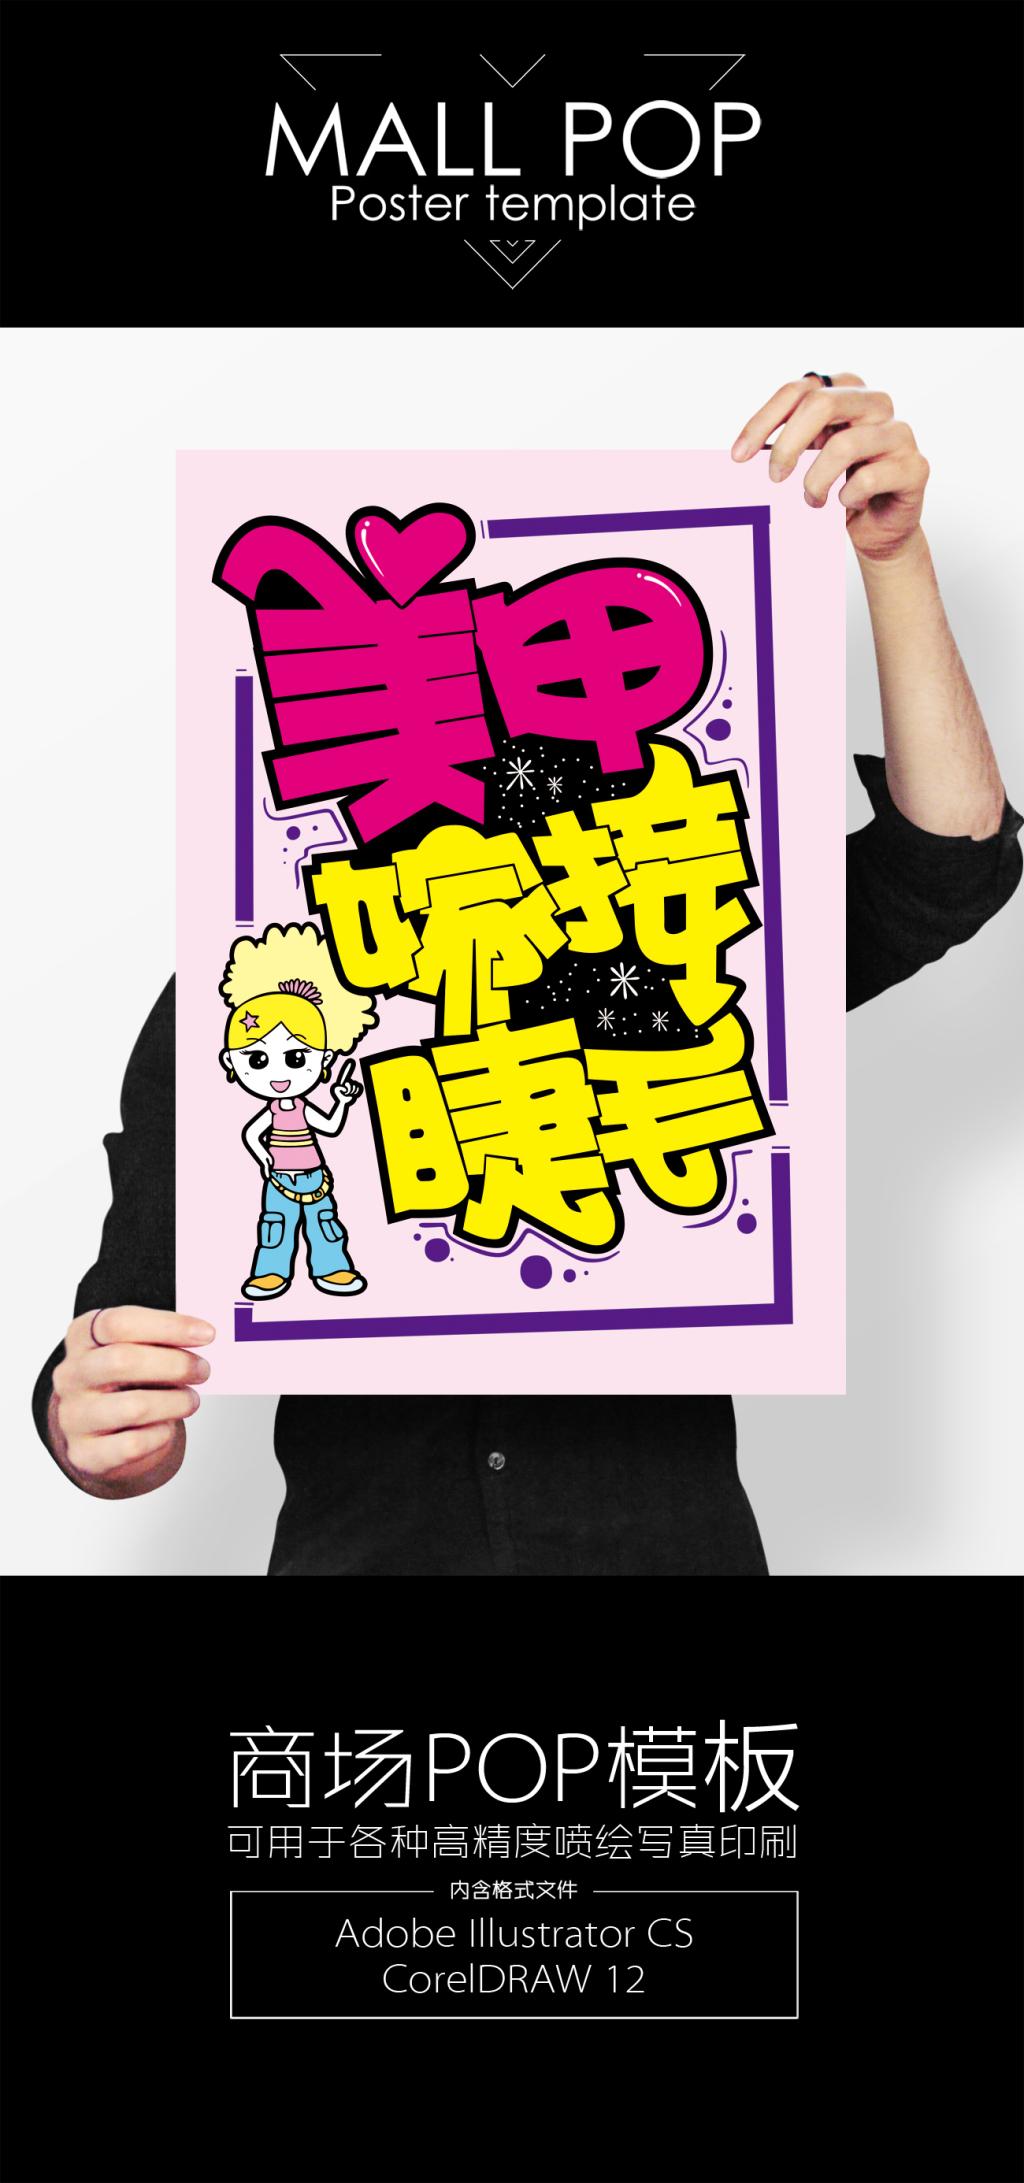 pop手绘海报美容美甲图片设计素材_高清cdr模板下载()